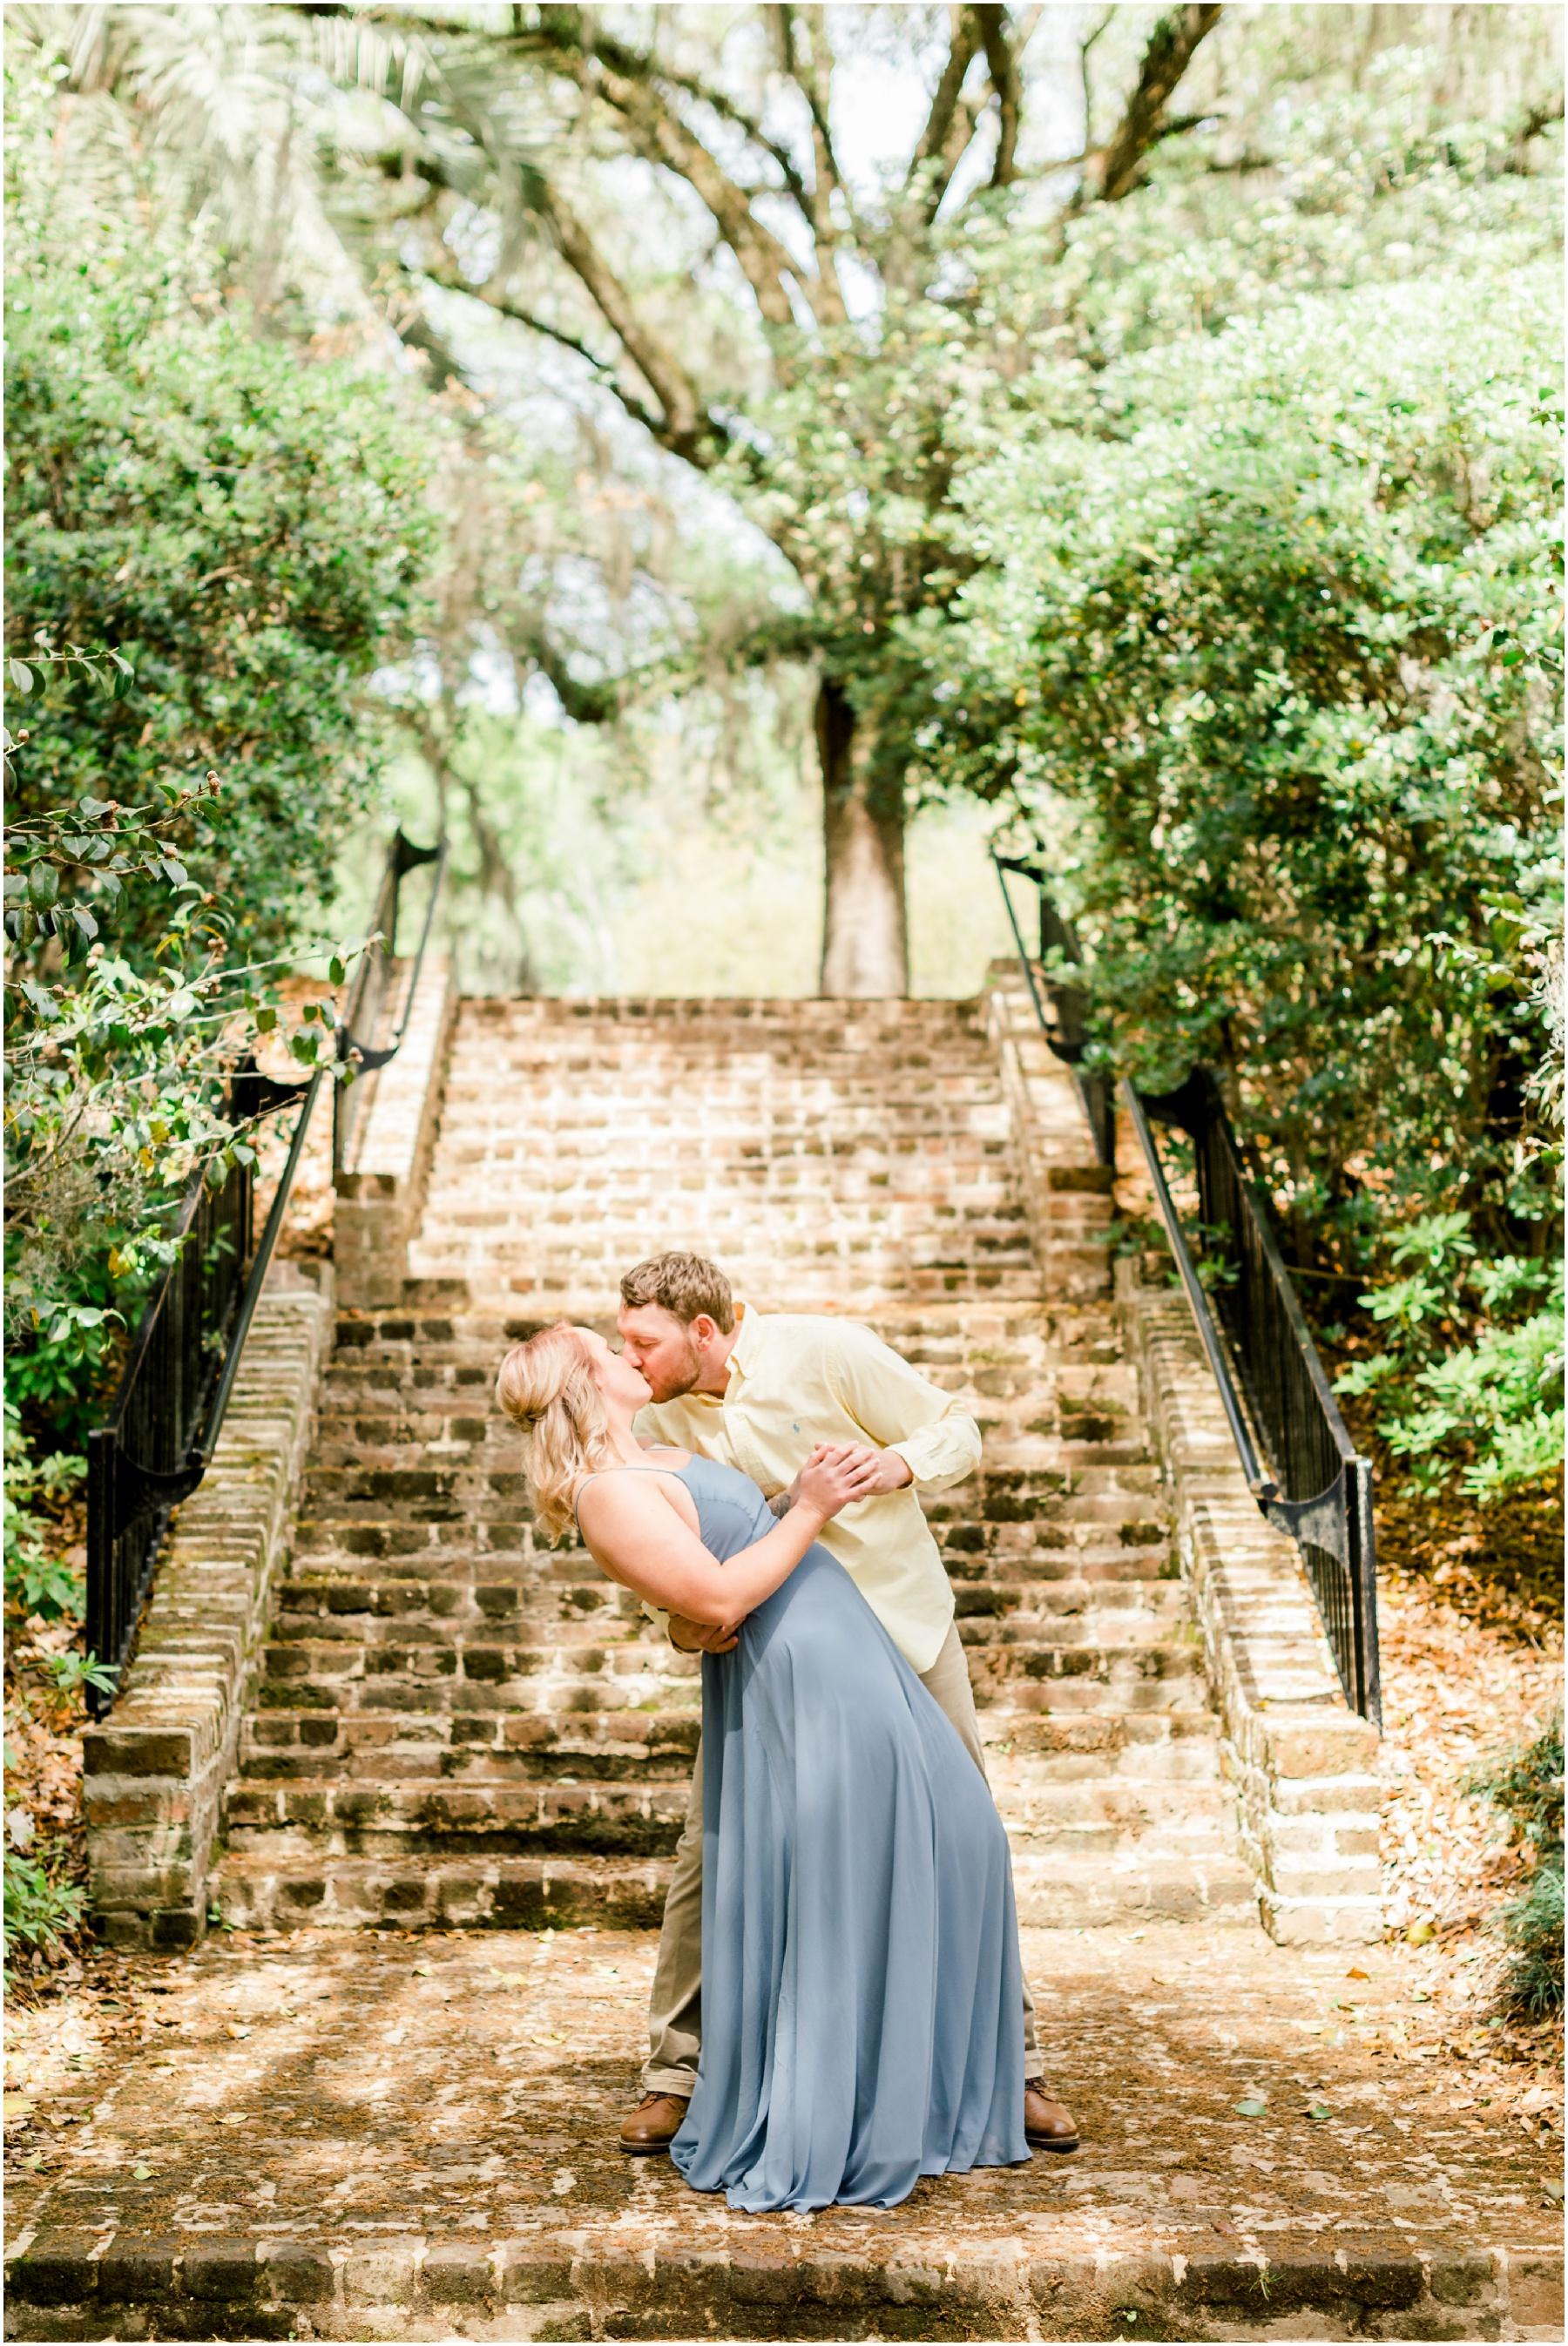 Mepkin-Abbey-Moncks-Corner-South-Carolina-Engagement-Session-Photos_0016.jpg